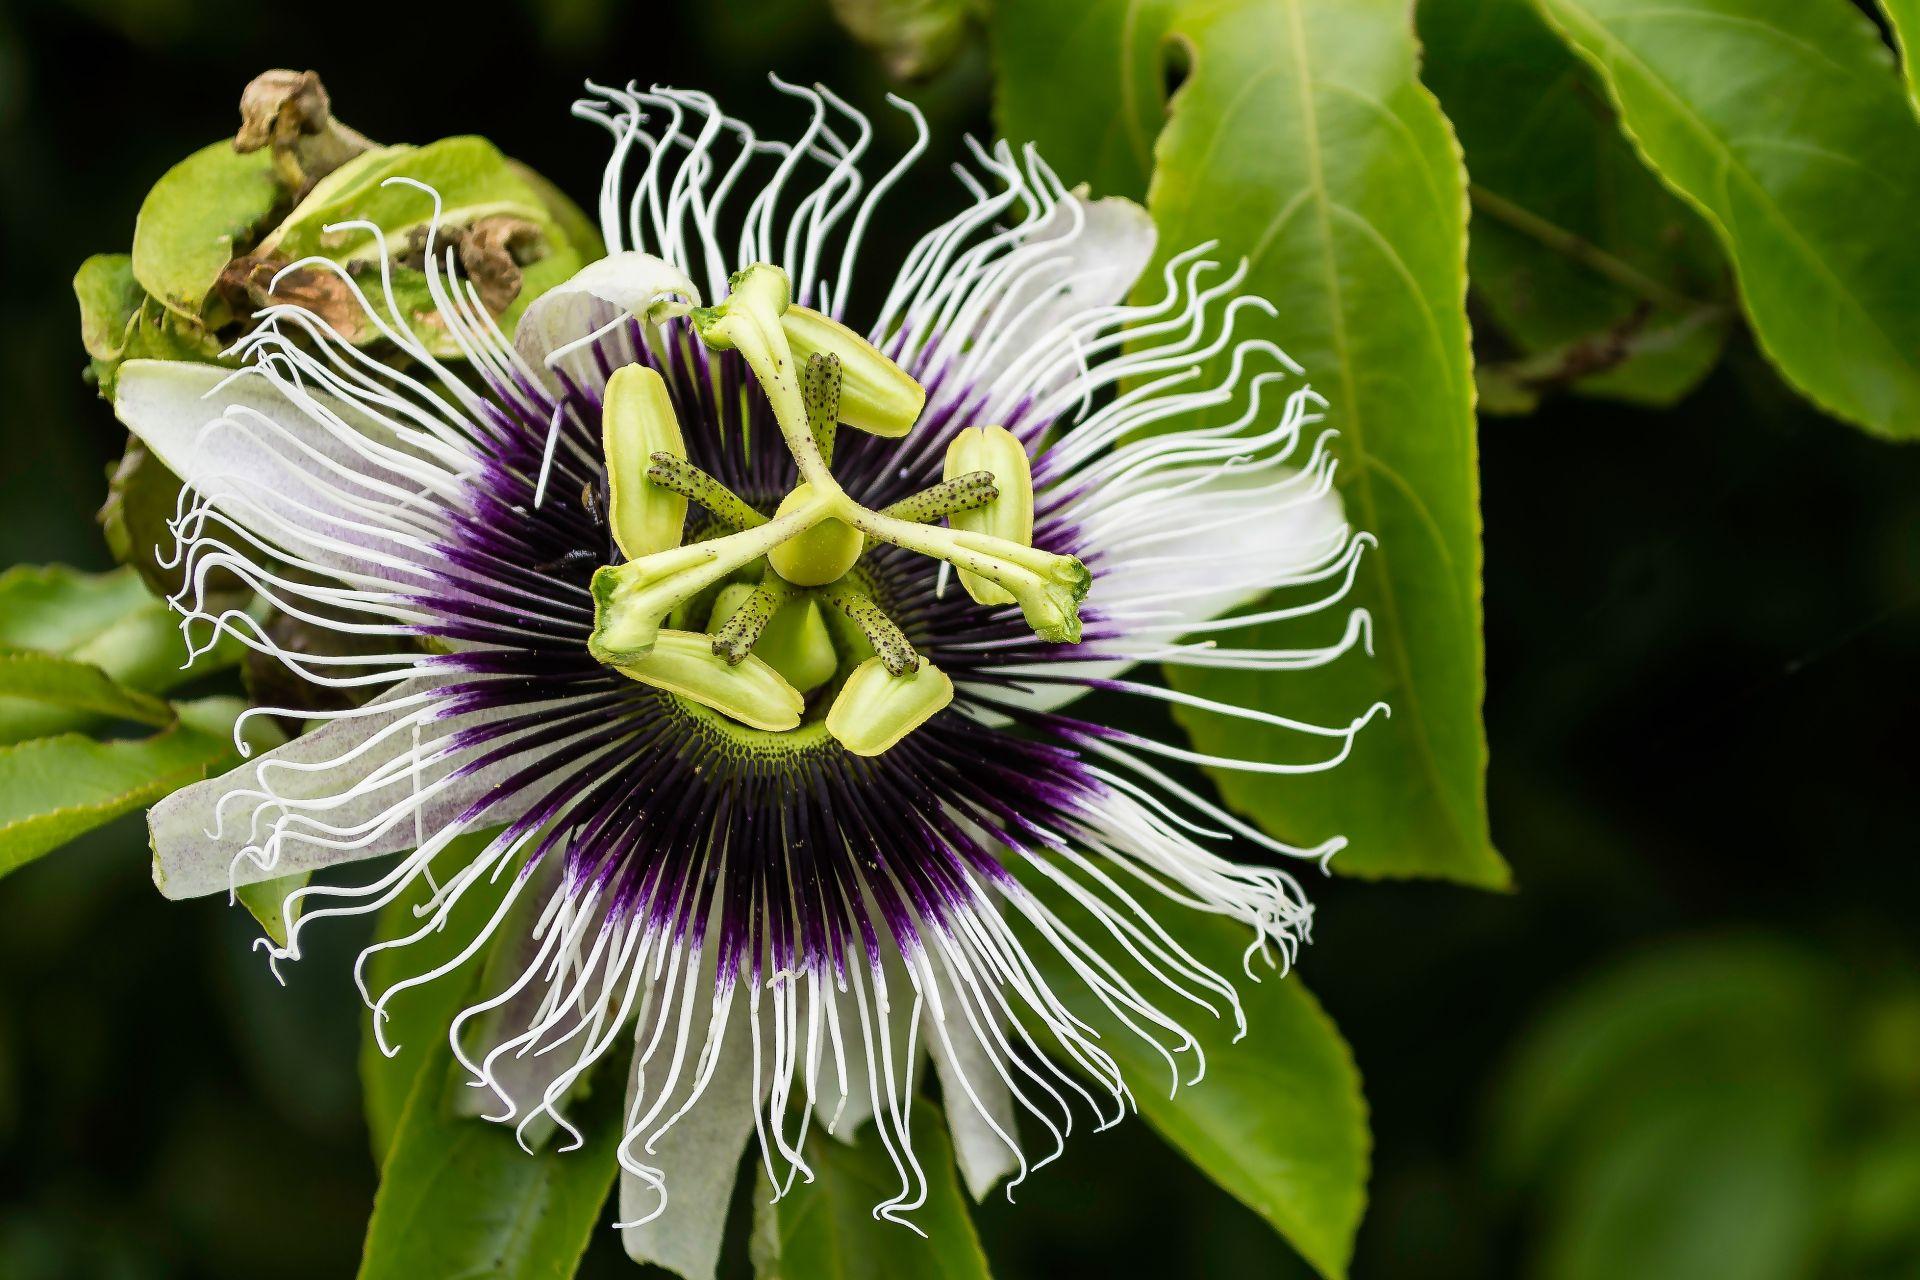 Flor do maracujá. Foto: Evelyn Hullinghorst / Unsplash